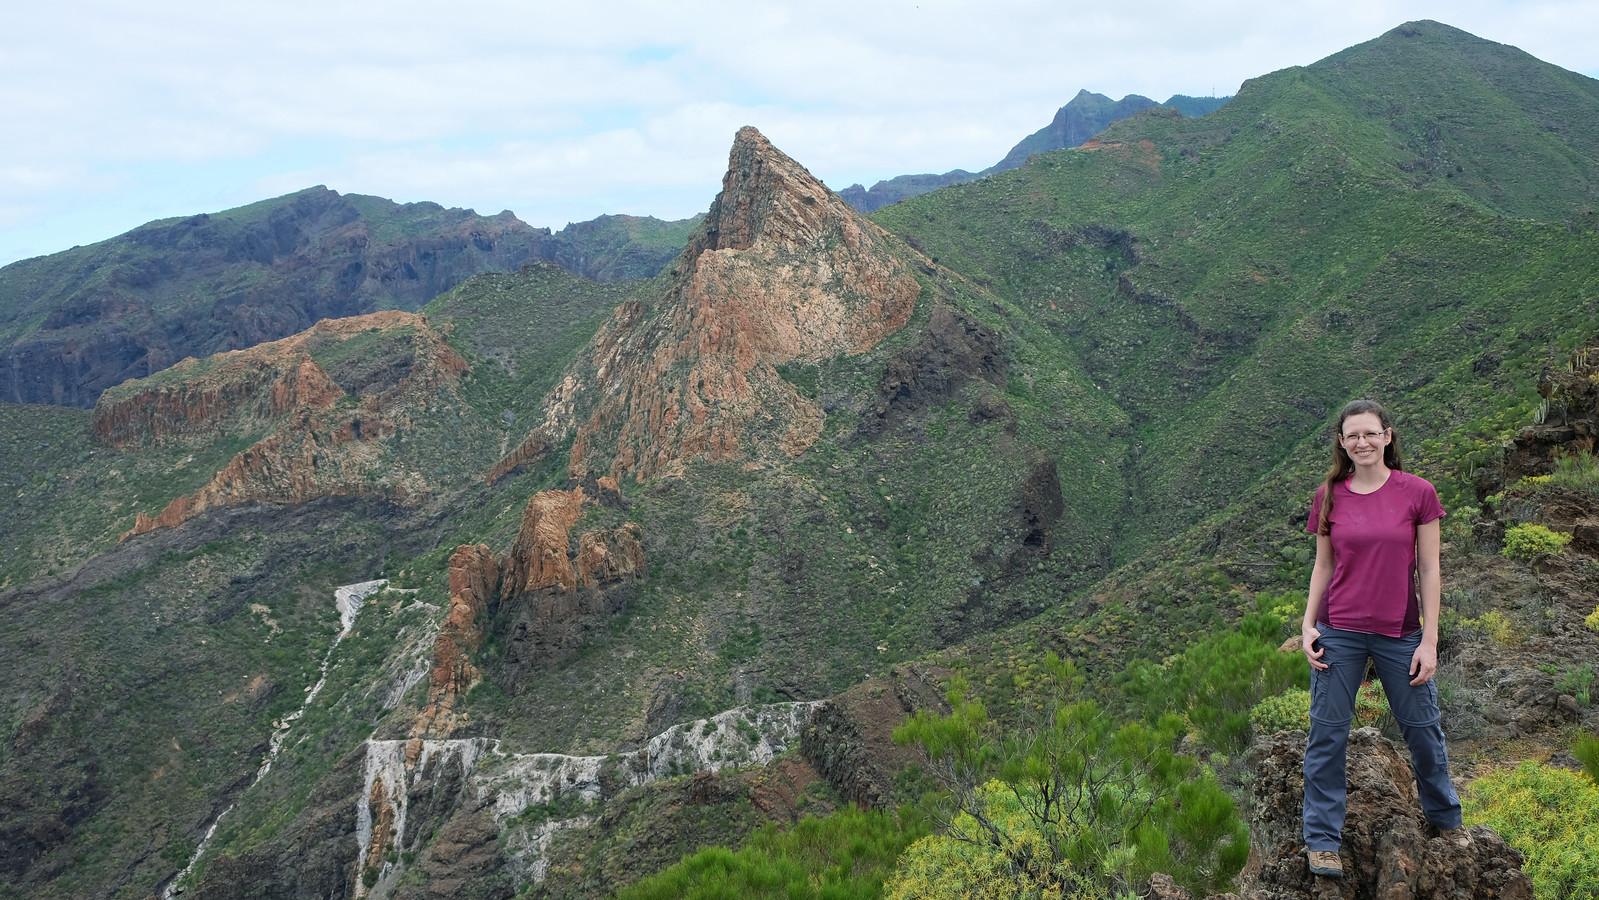 Tamaimo and Montaña de Guama Circuit Trail, Teno Rural Park, Tenerife, Canary Islands, Spain